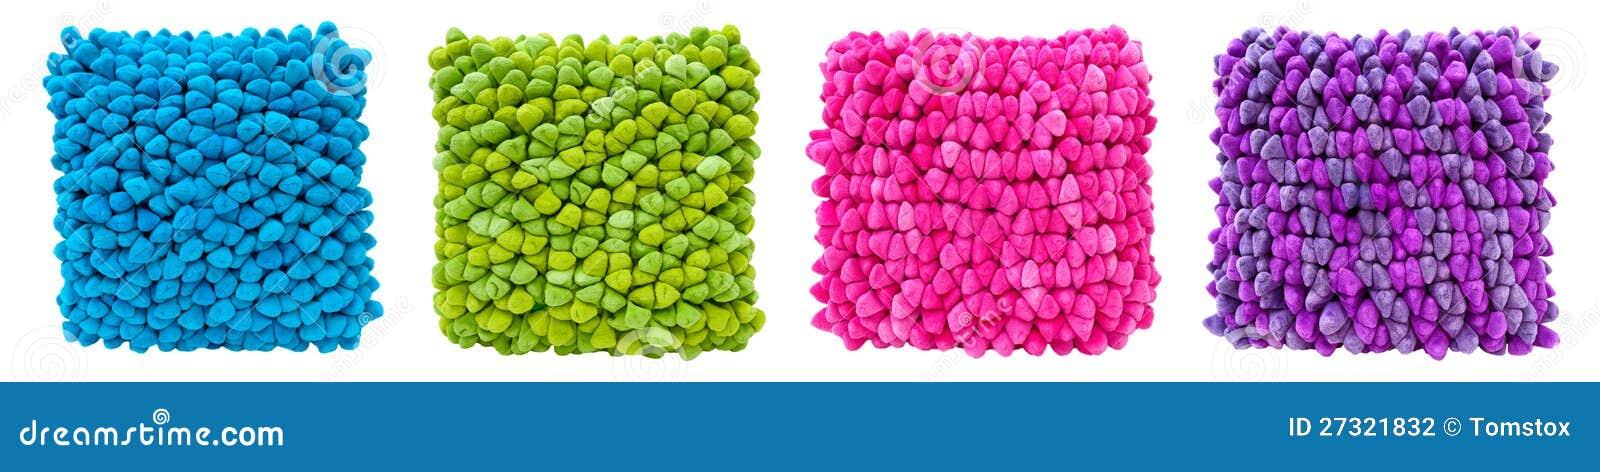 Moderne Kissen moderne innenarchitektur helle farbige kissen stockfoto bild